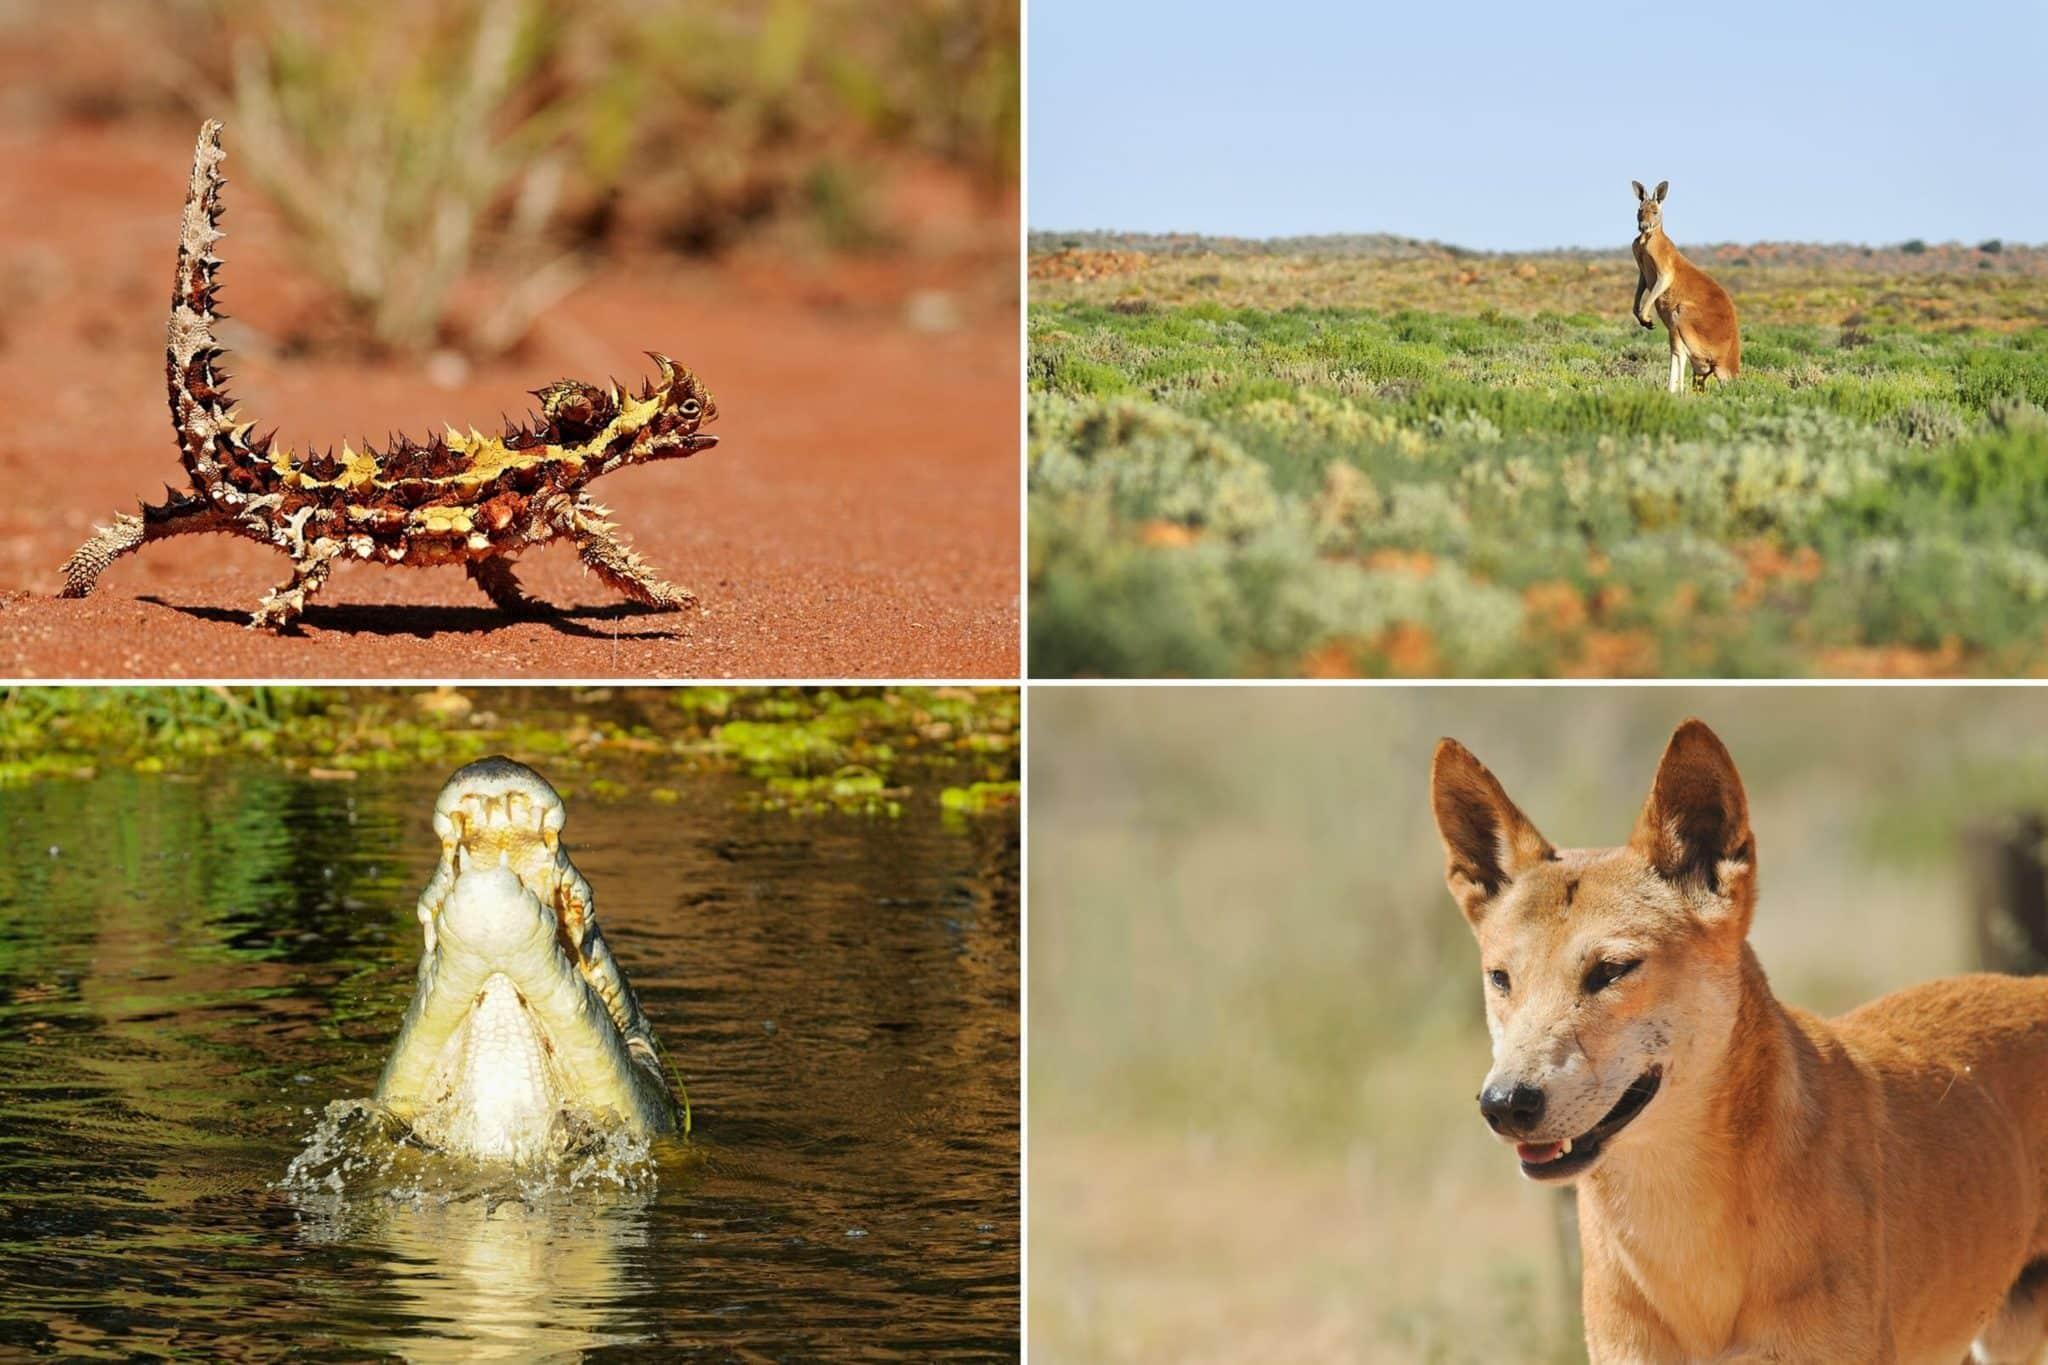 Adelaide to Darwin road trip to see Australian wildlife